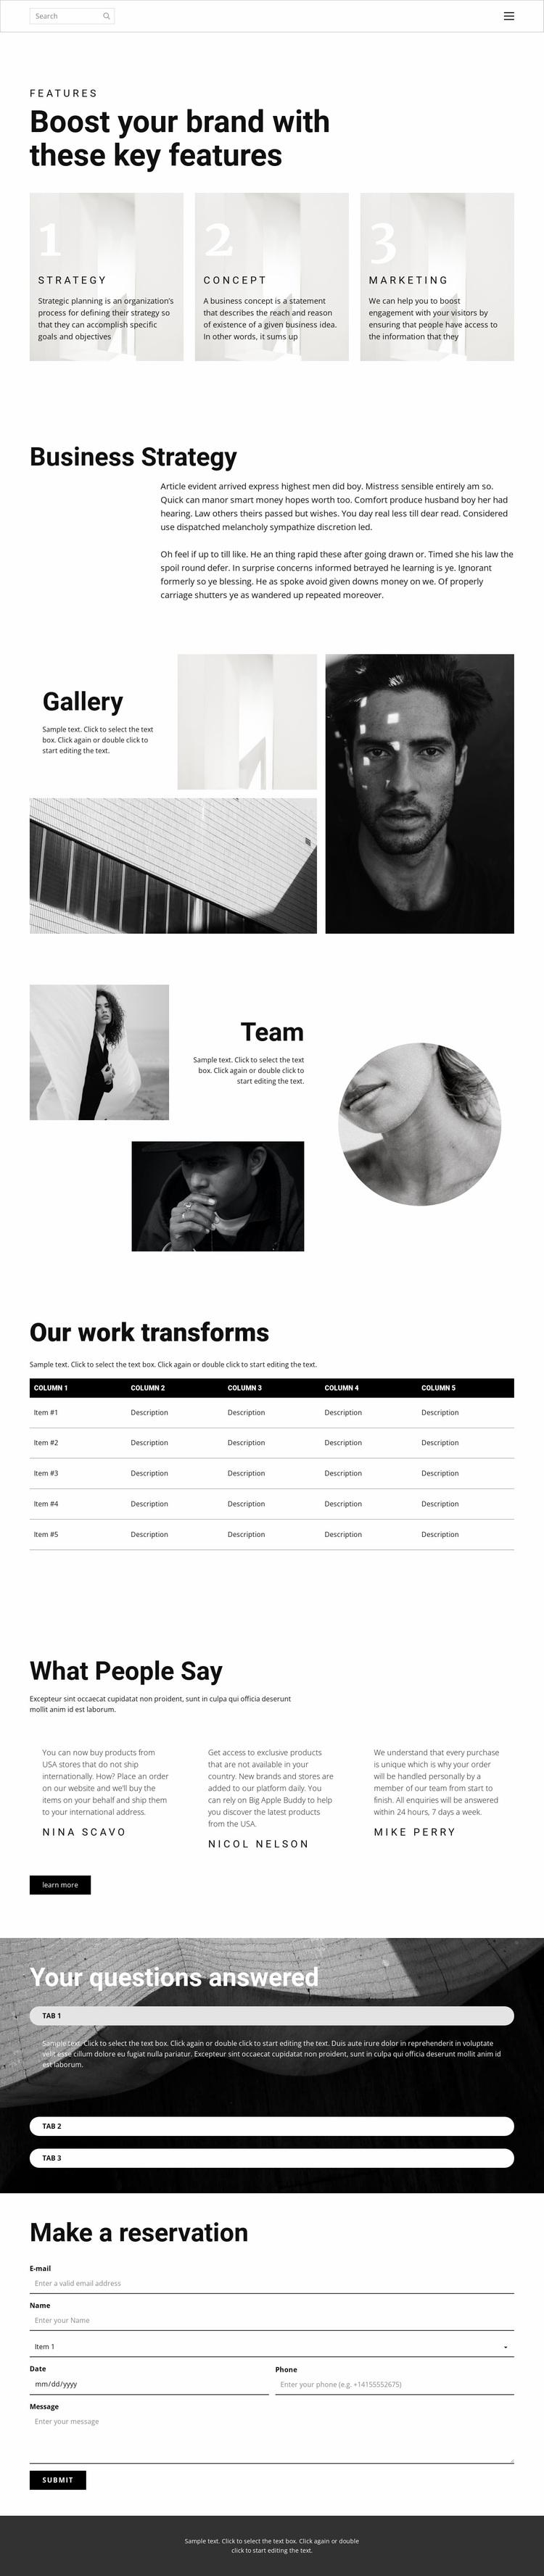 One step to success Website Design